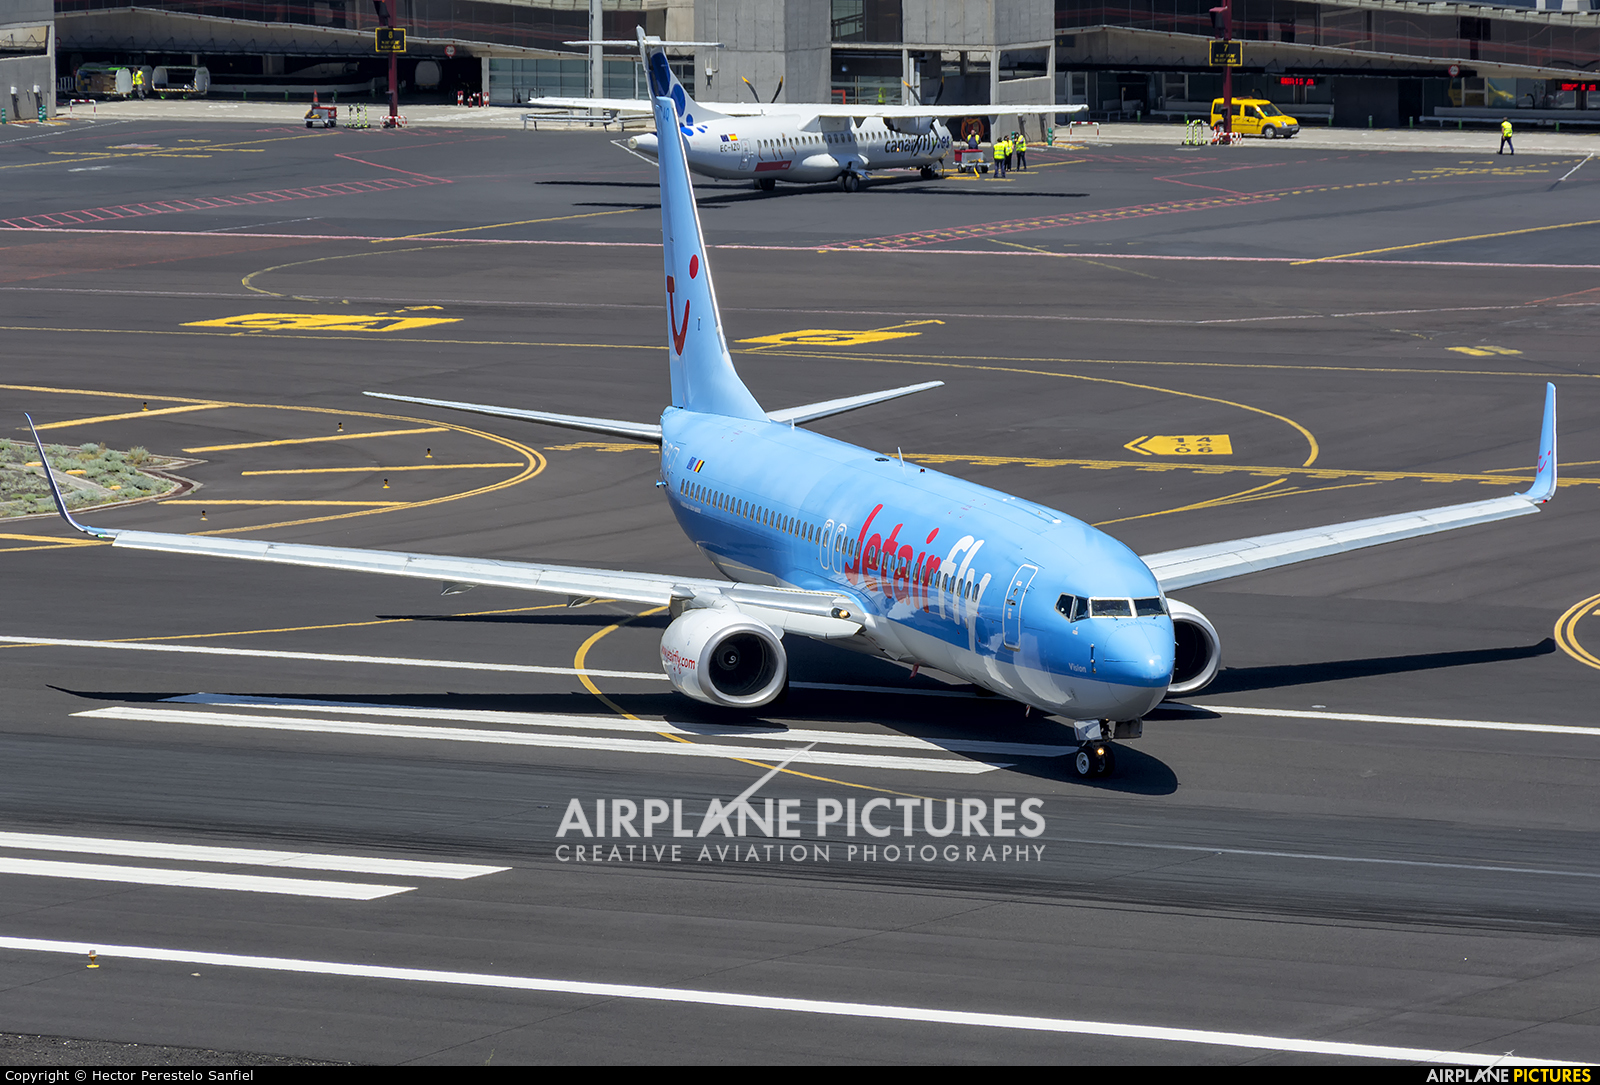 Jetairfly (TUI Airlines Belgium) OO-JAQ aircraft at Santa Cruz de La Palma